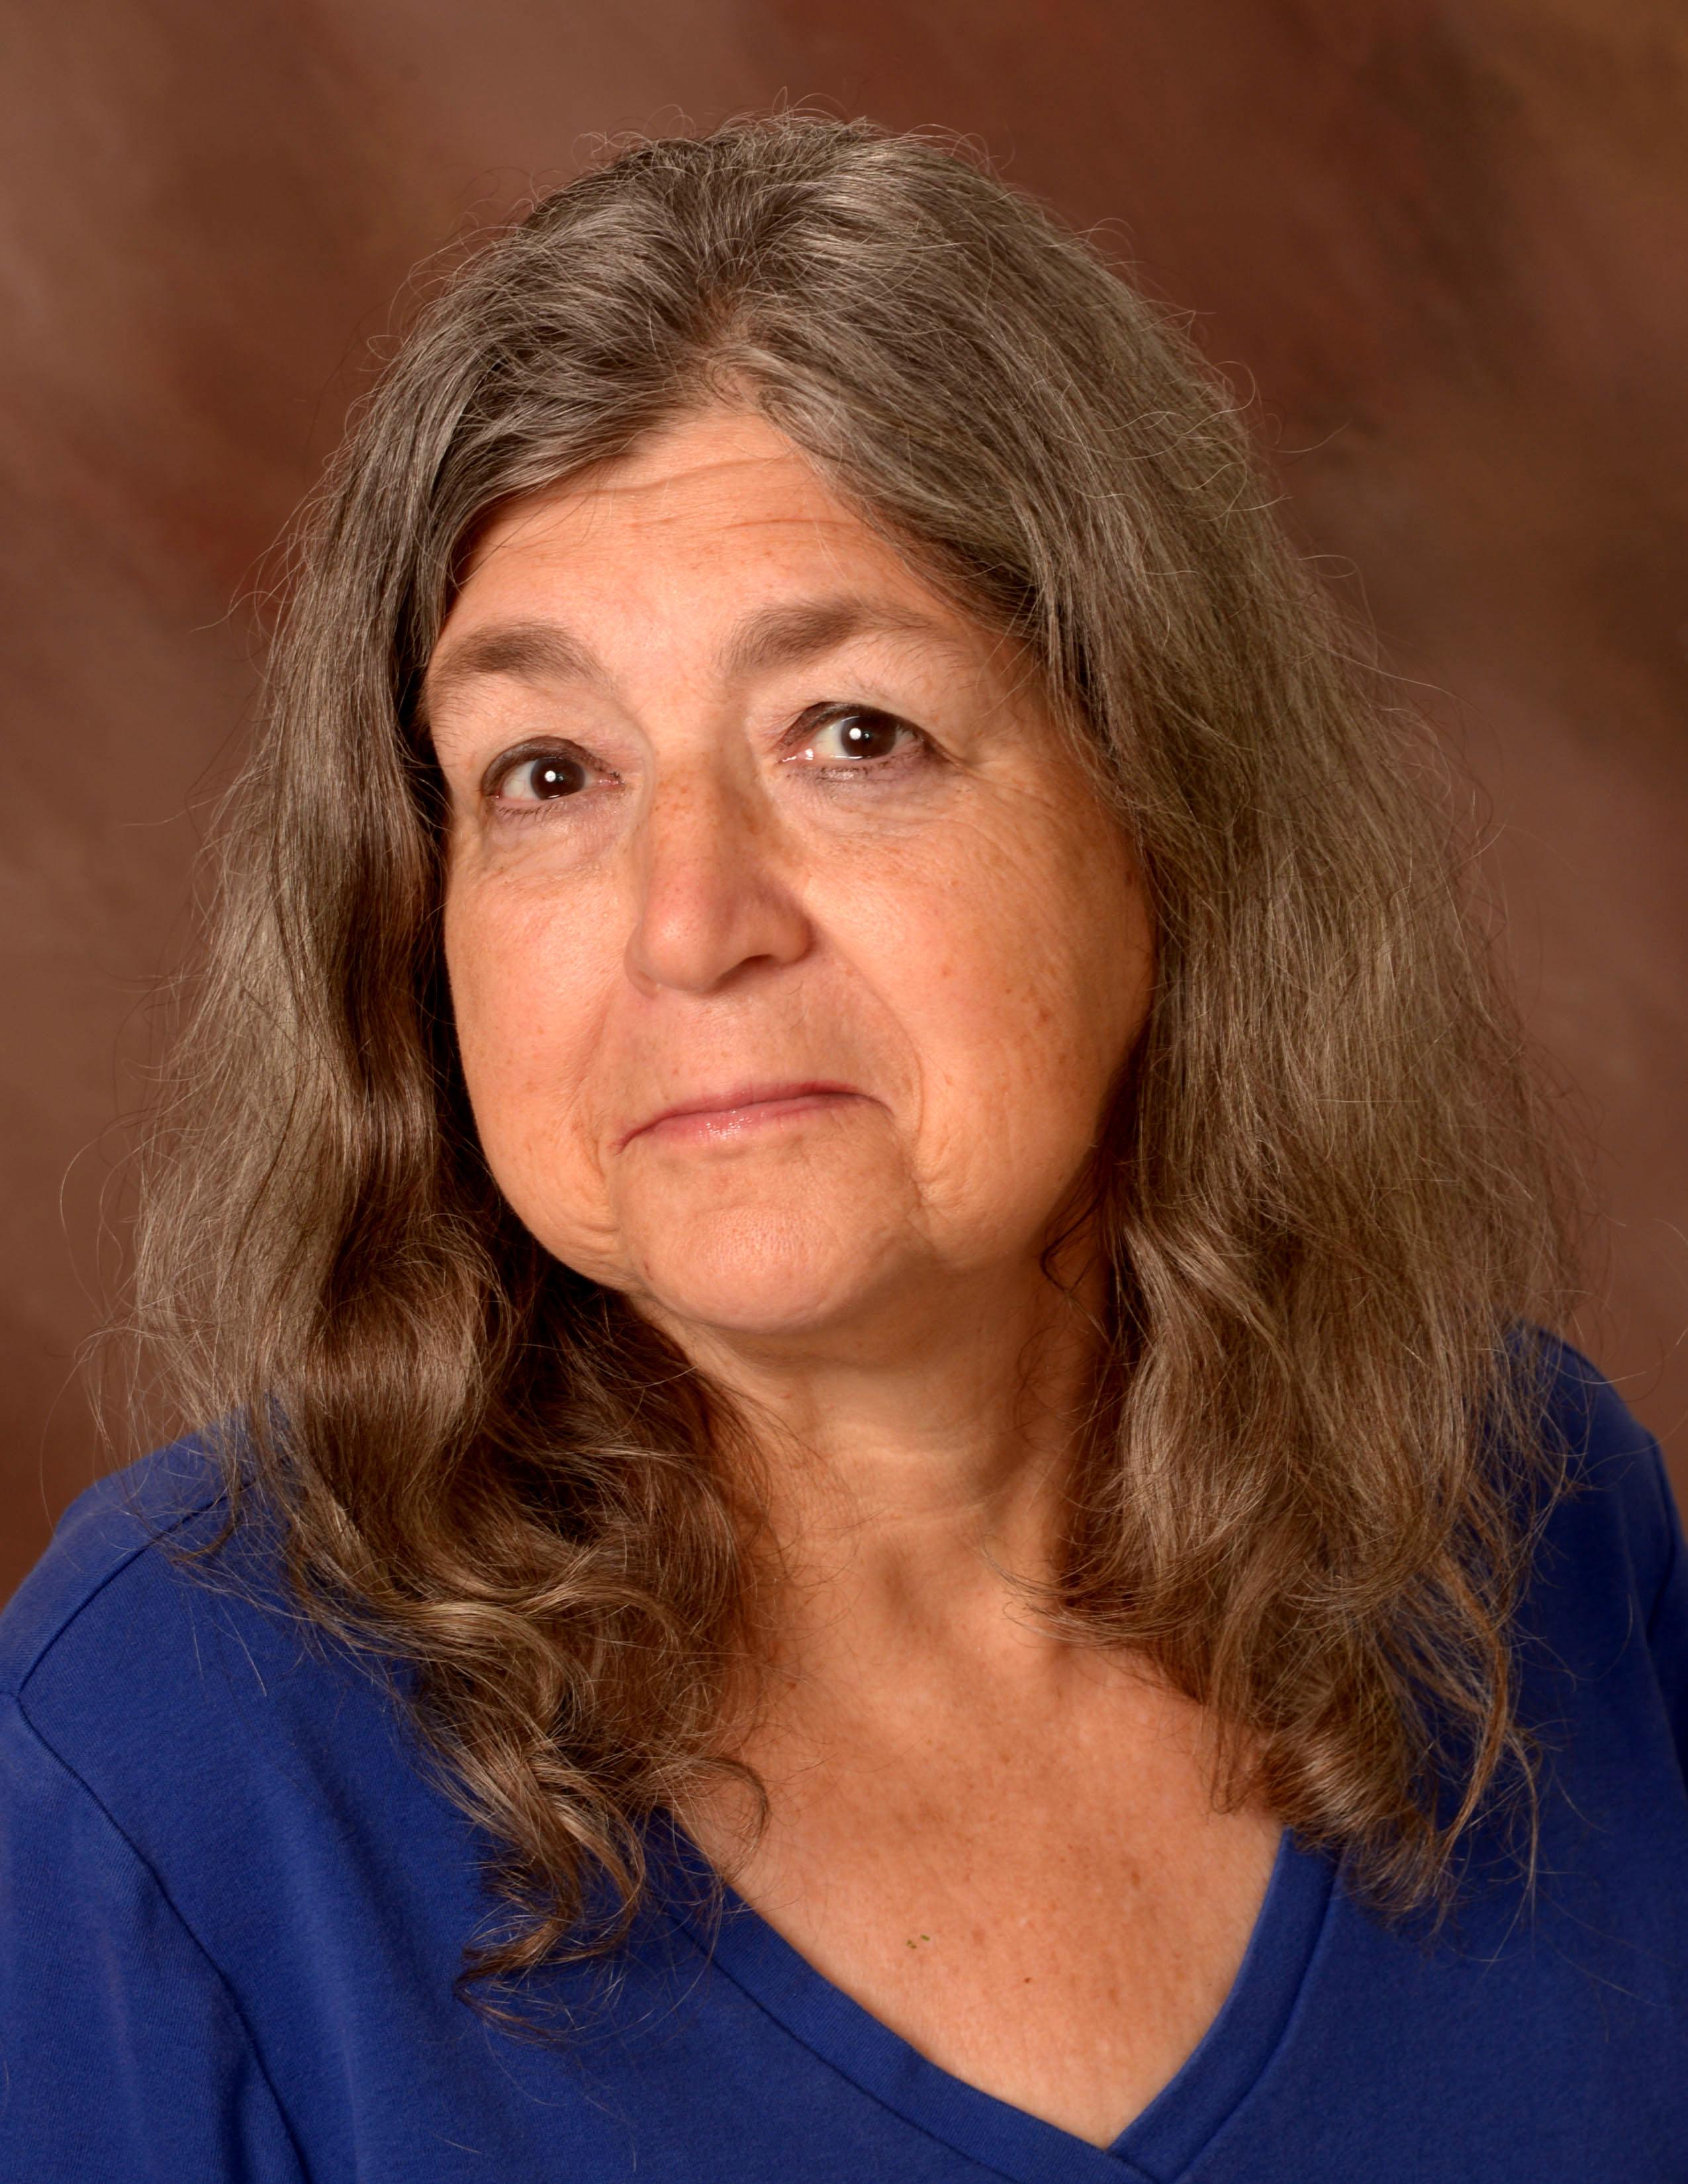 Donna McCrohan Rosenthal